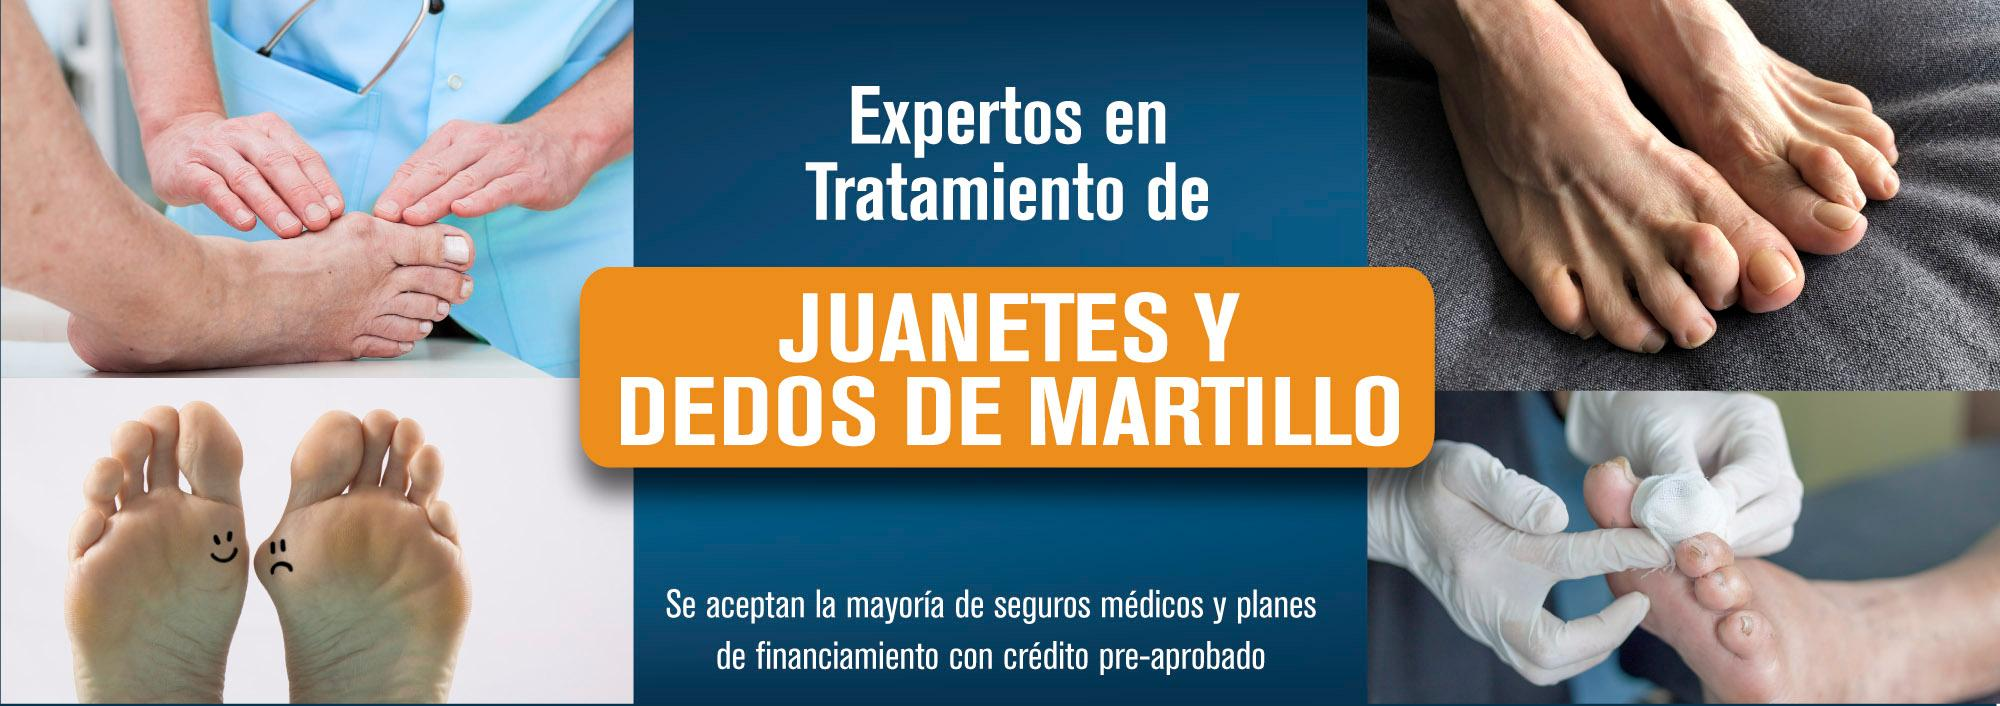 Web_banner_Juanetes